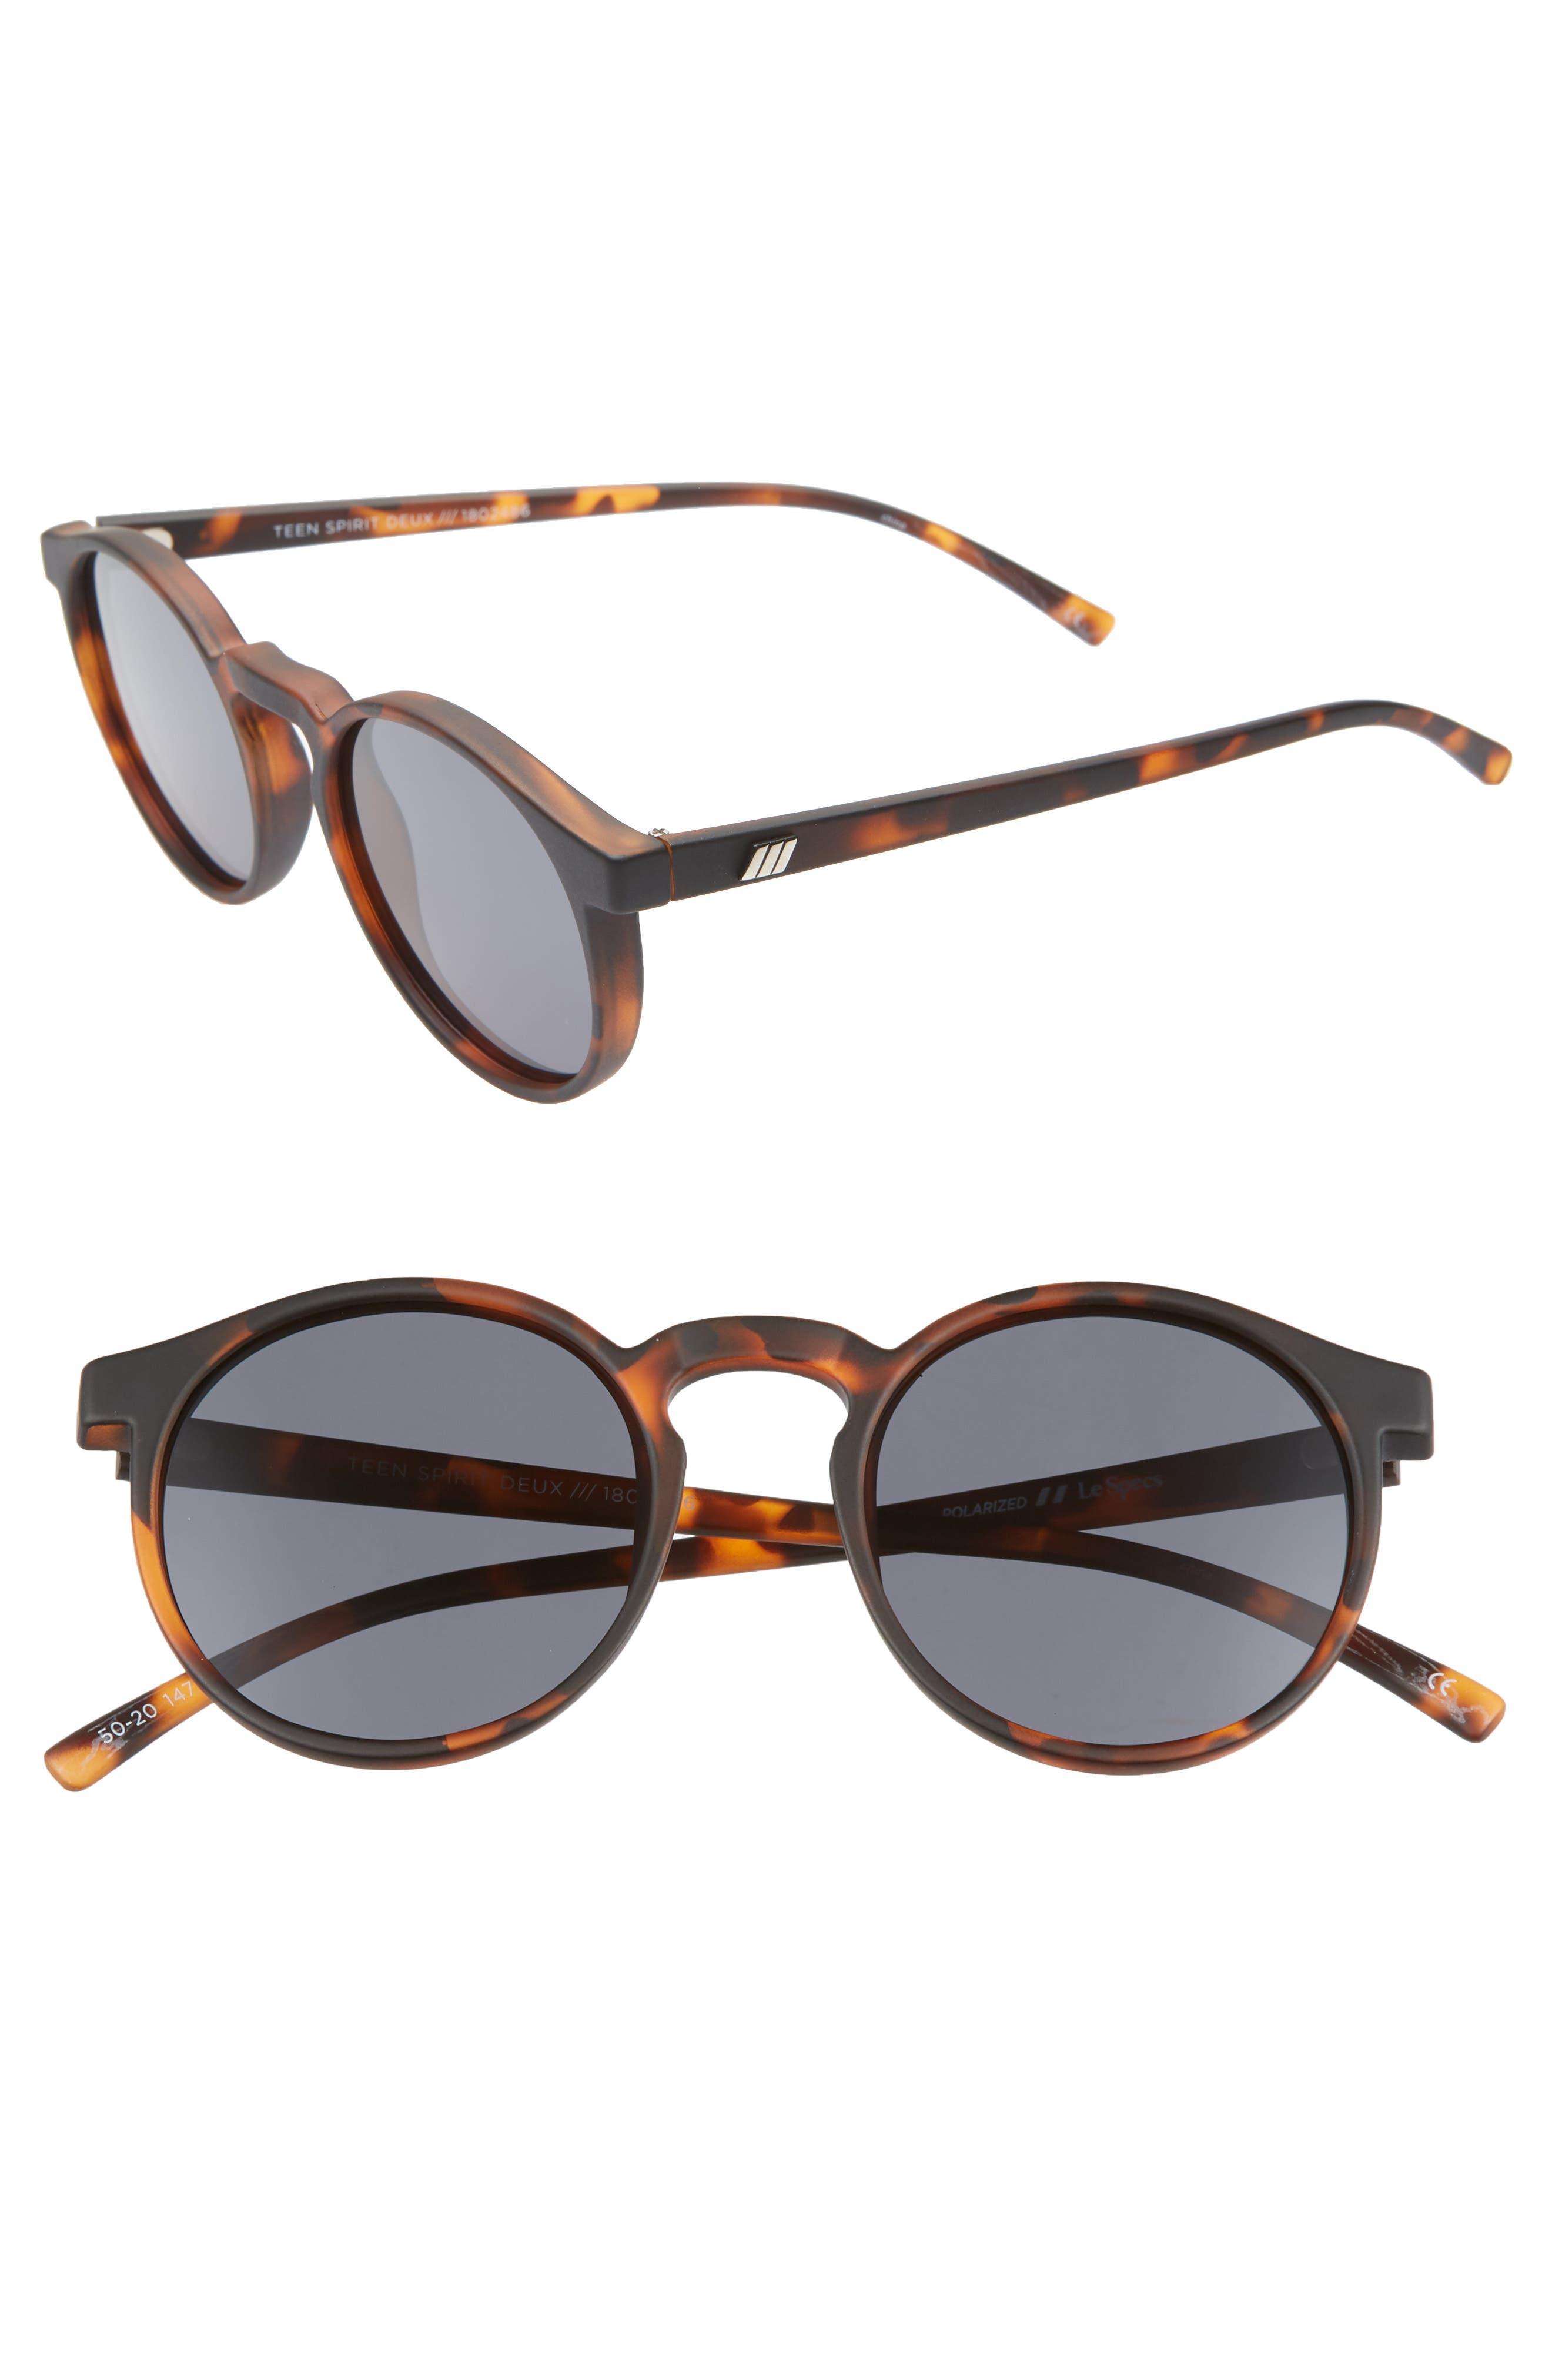 Le Specs Teen Spirit 50Mm Polarized Round Sunglasses - Matte Tortoise